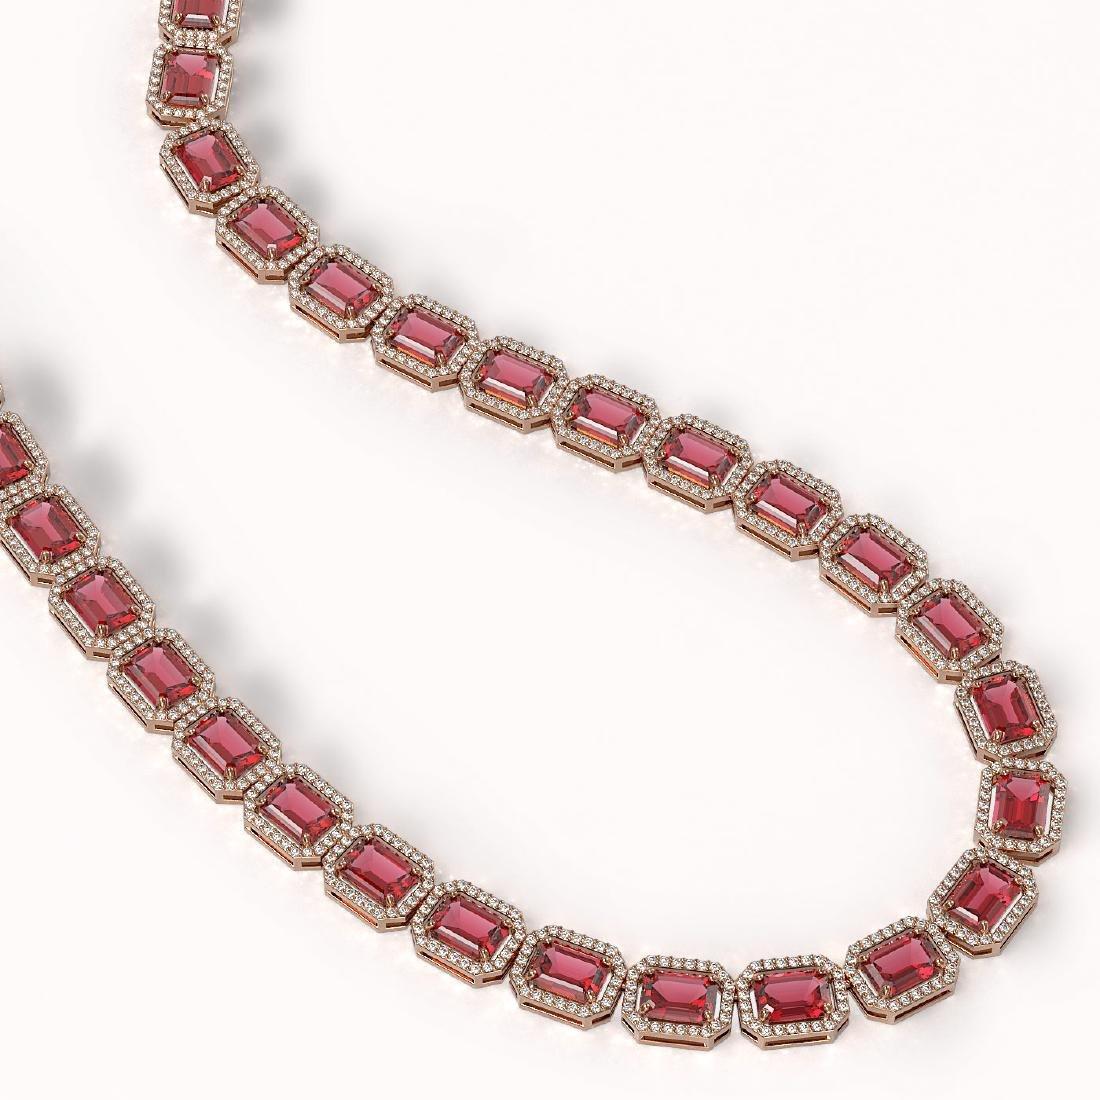 60.49 CTW Tourmaline & Diamond Halo Necklace 10K Rose - 2